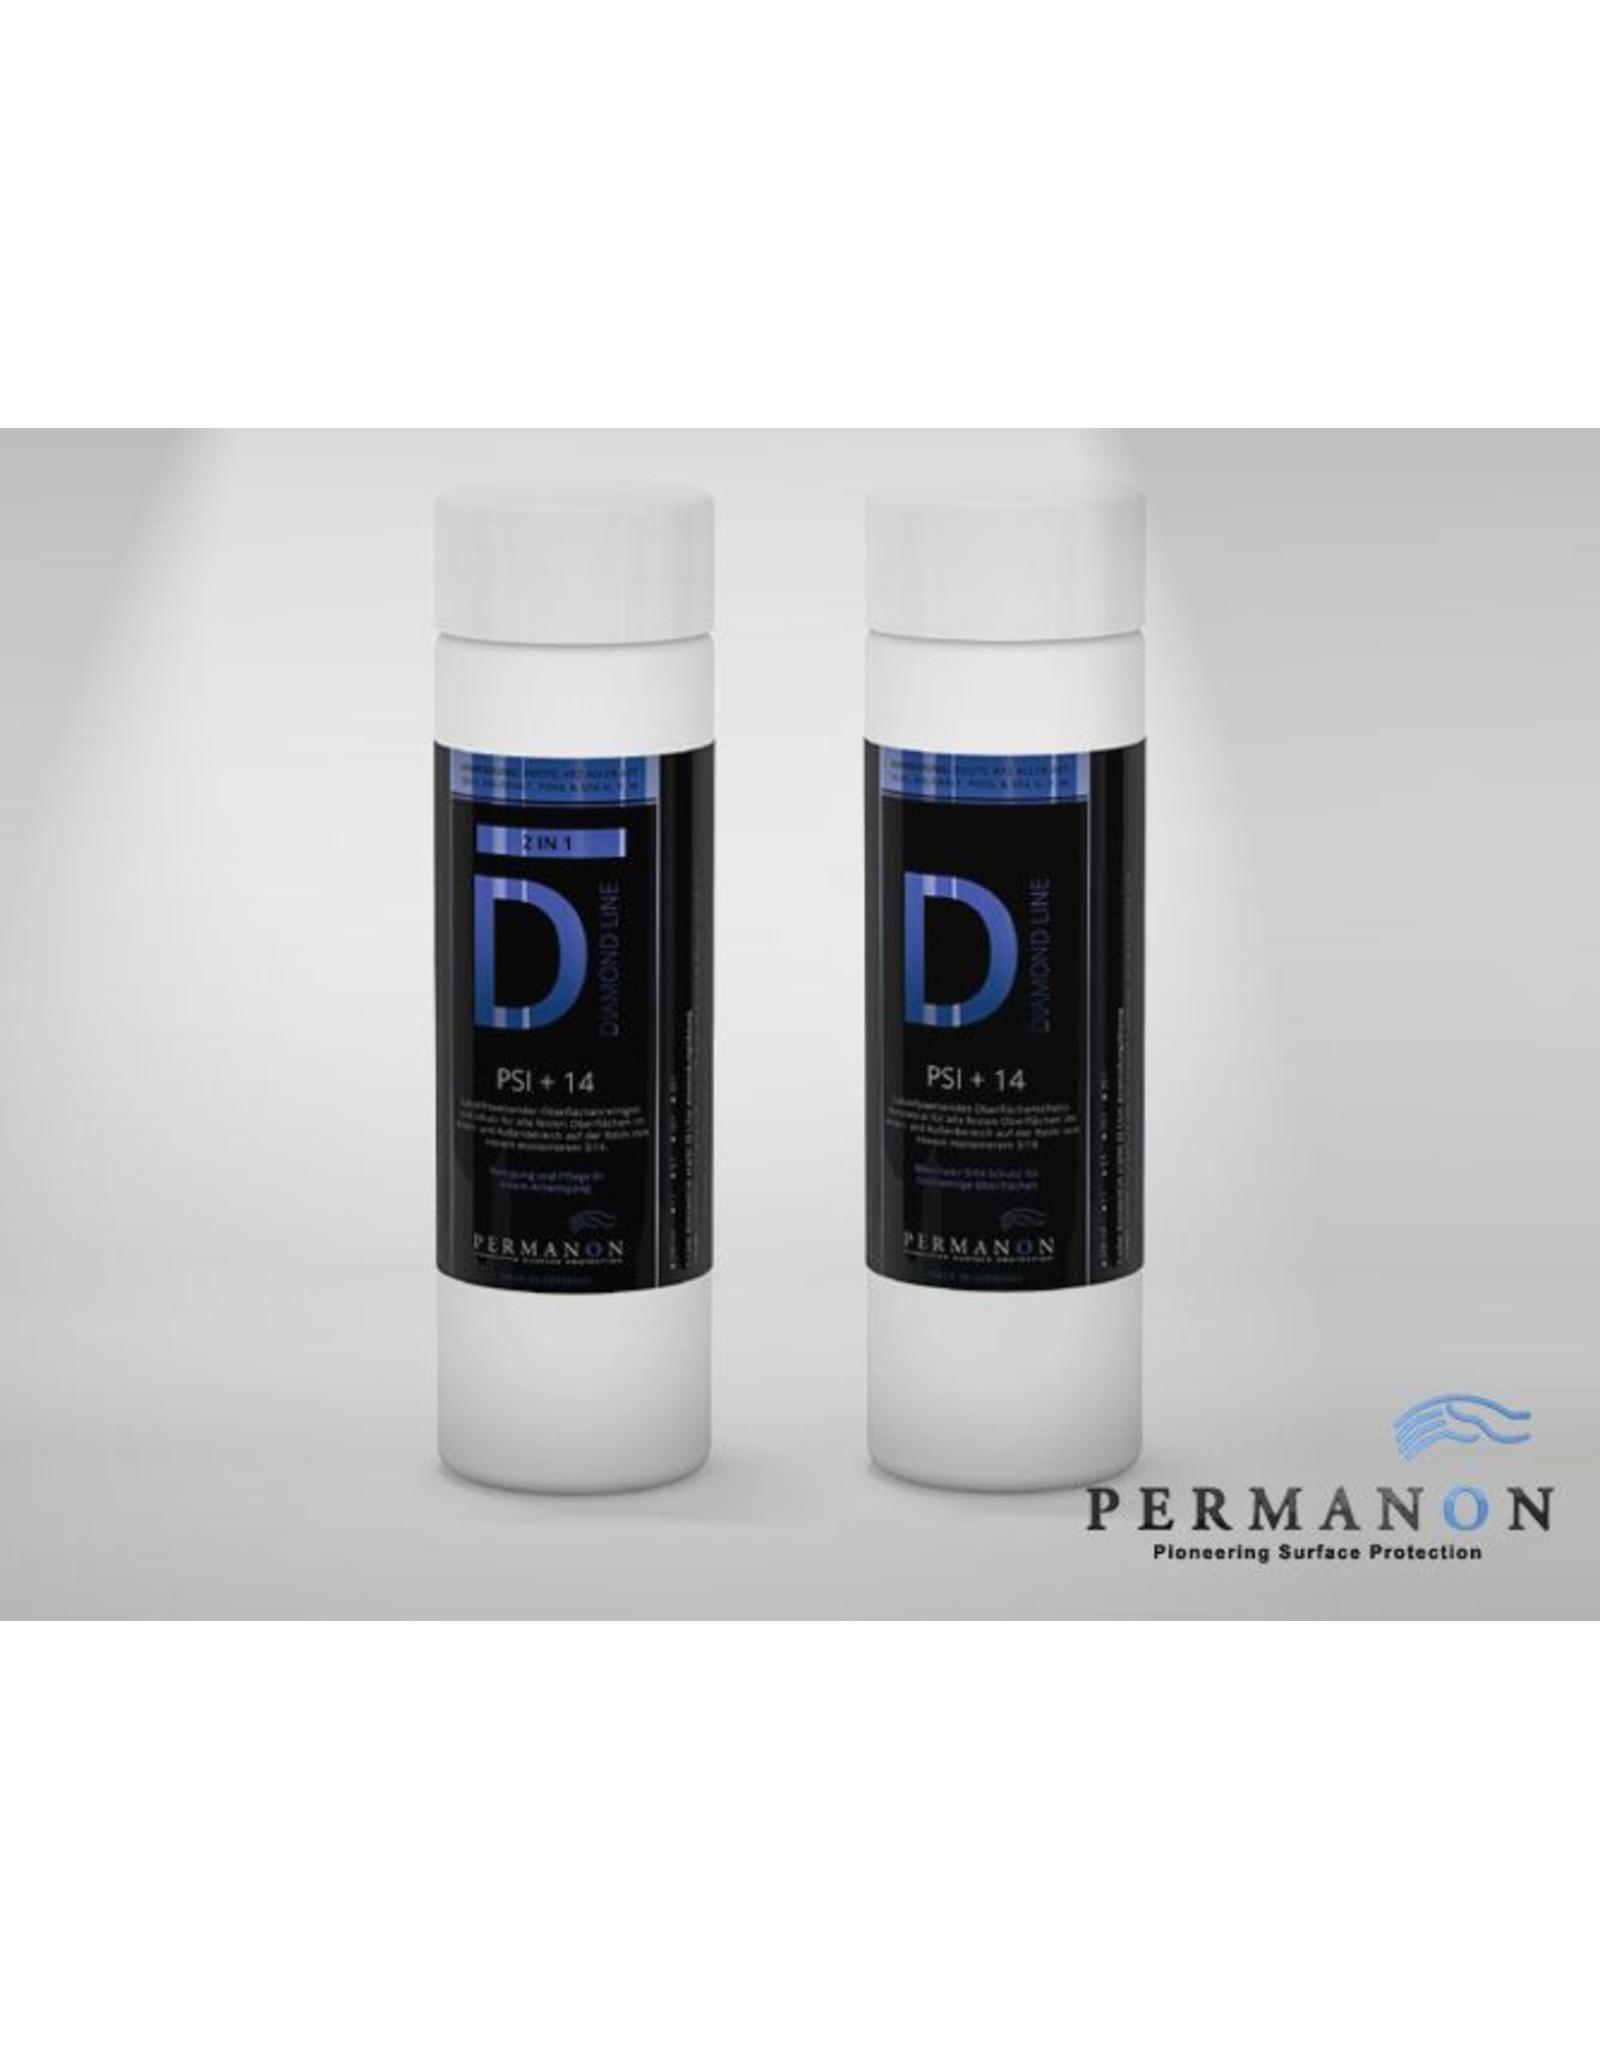 Permanon Diamond 500ml Ready To Use